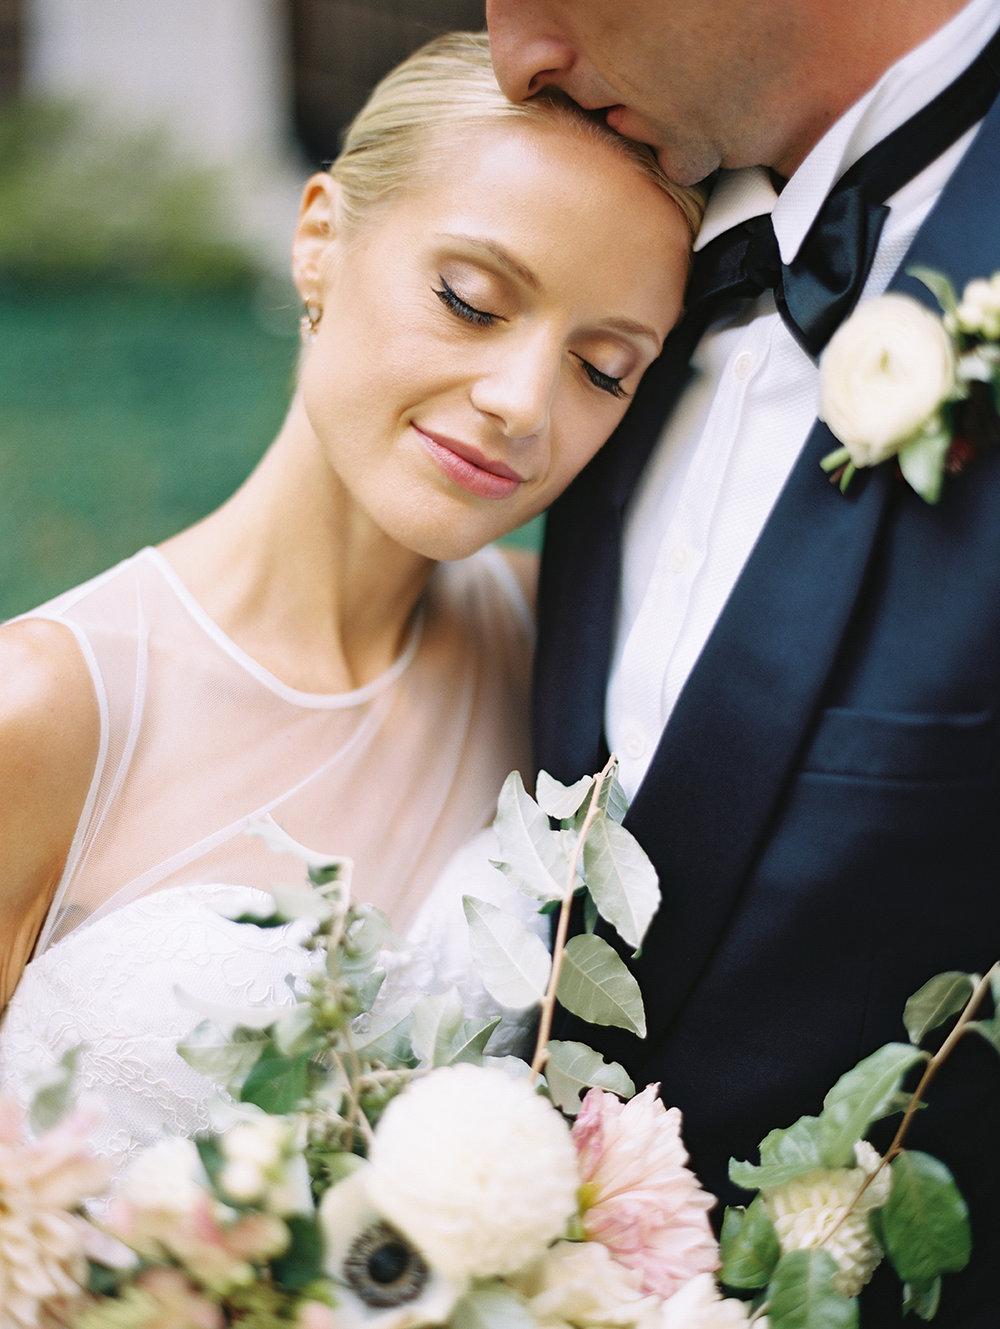 301_Kent+Katie_Fine_Art_Film_Photography_Boston_Public_Library_Wedding_Brumley & Wells.jpg